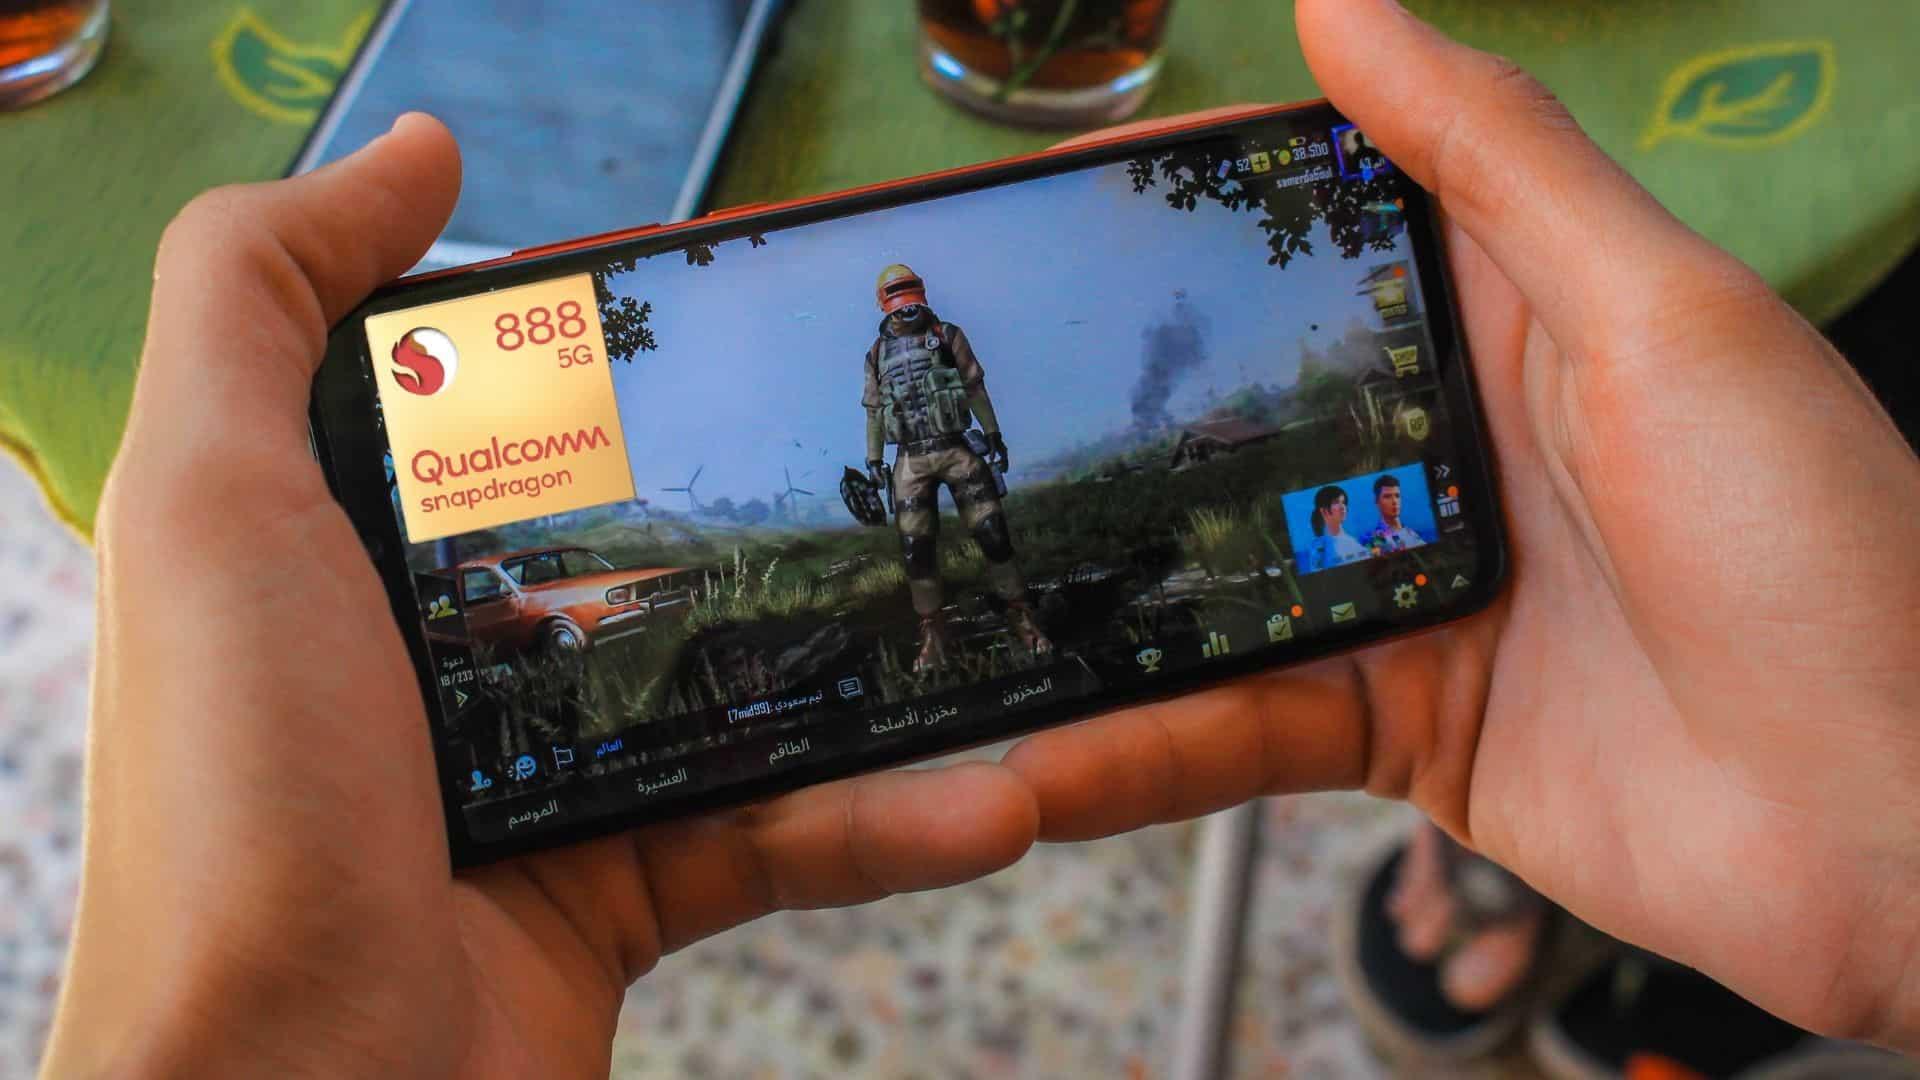 Qualcomm Snapdragon 888 gaming